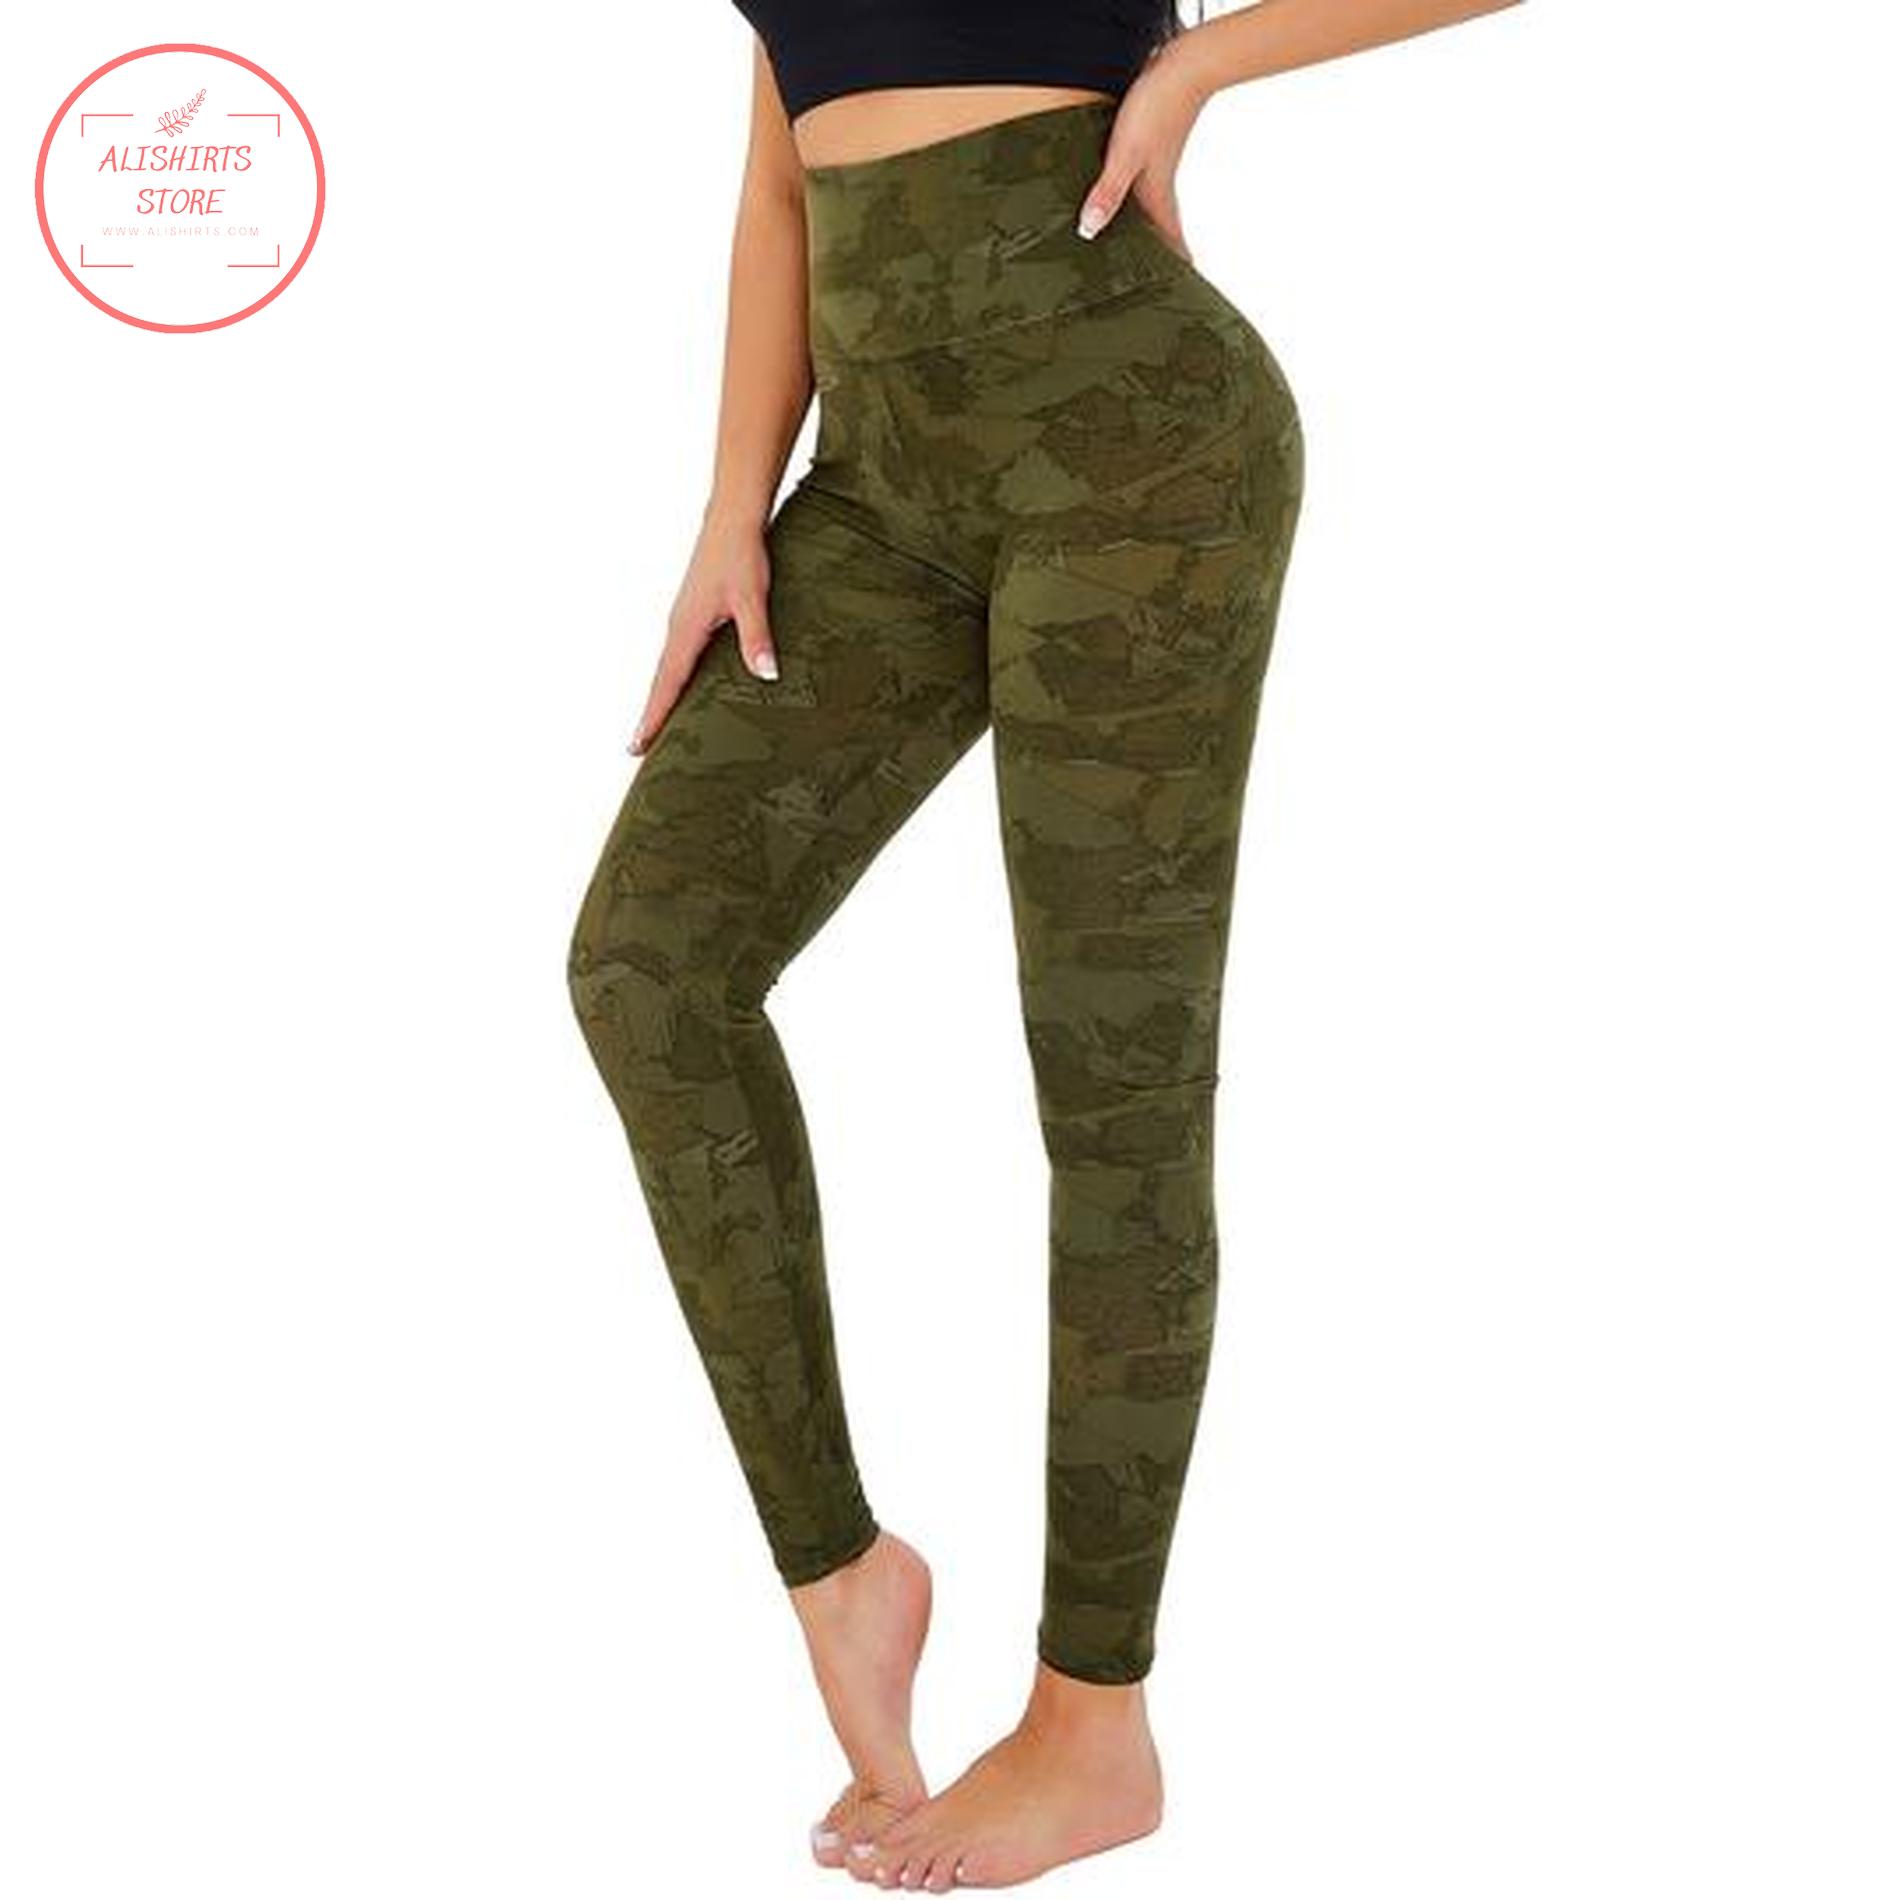 Moss Green Camo Legging